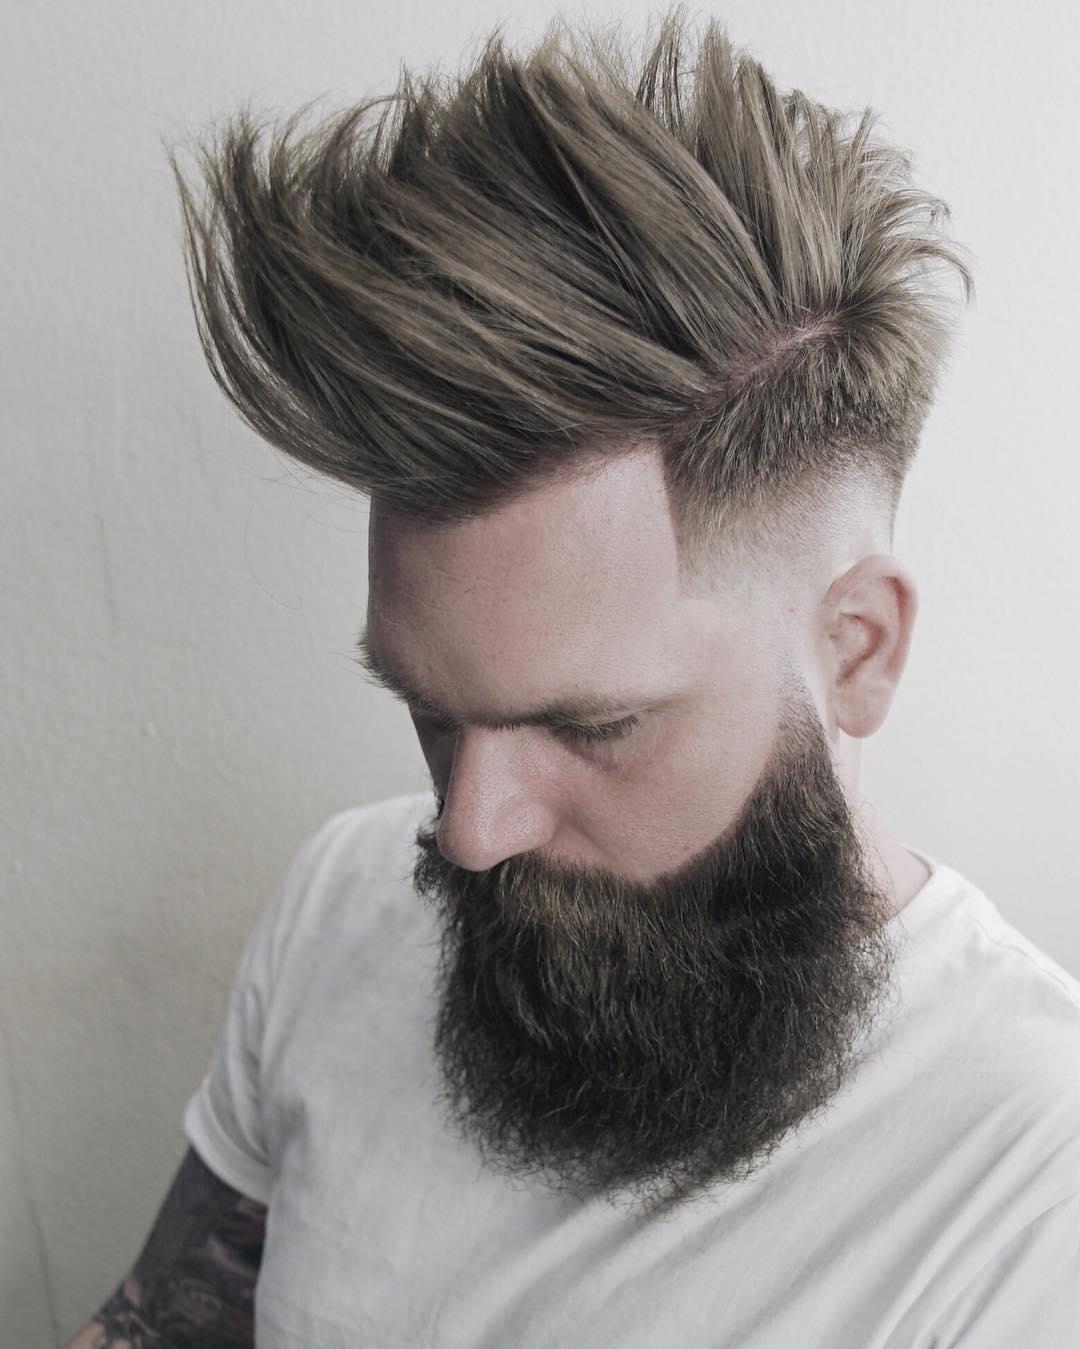 staygold31 fauxhawk medium length haircuts 2018